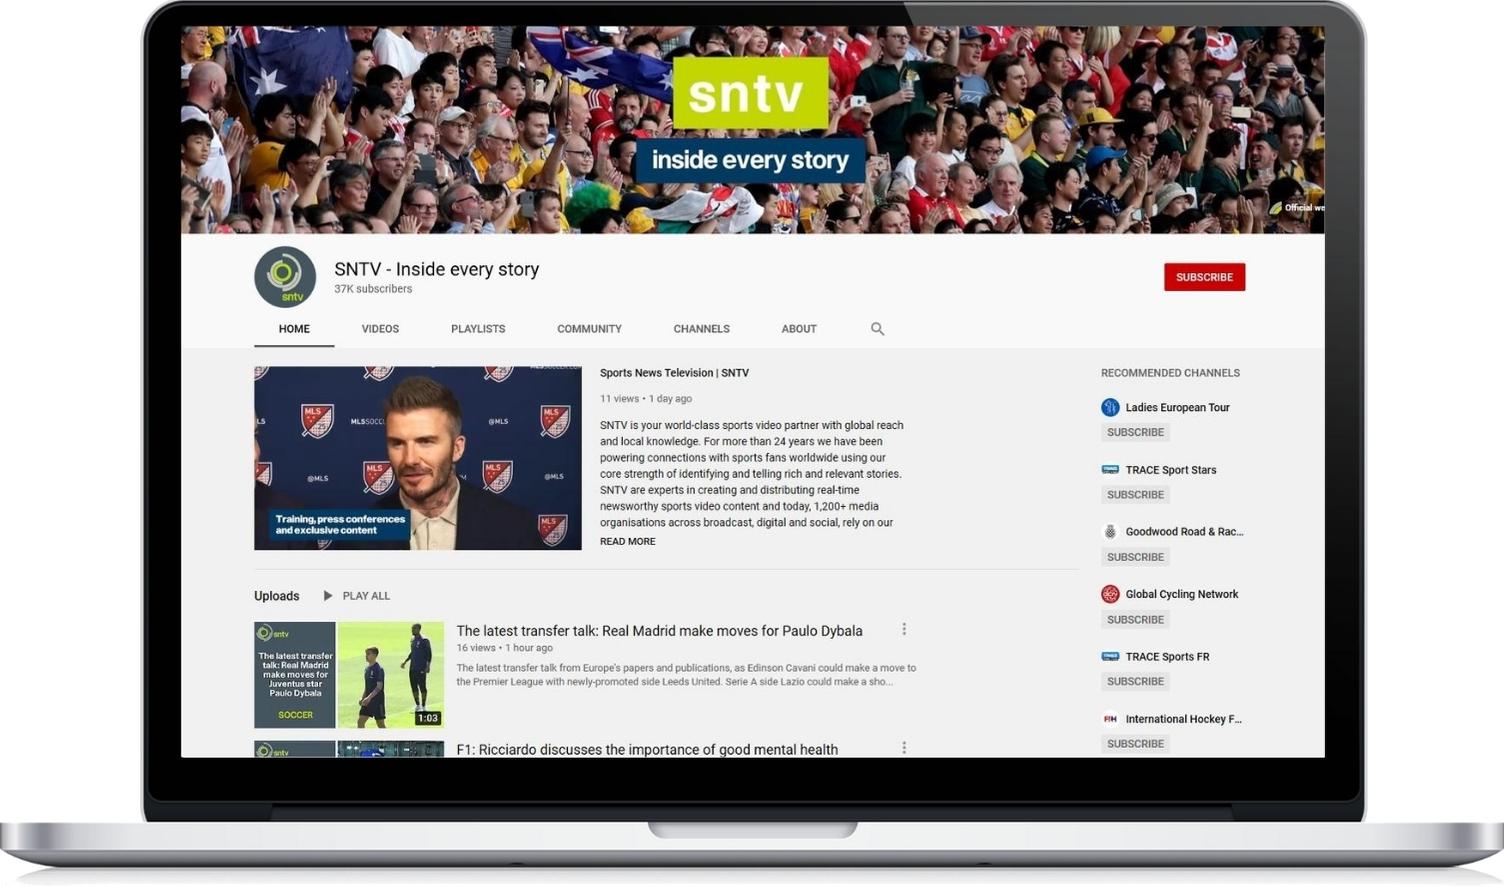 SNTV on YouTube